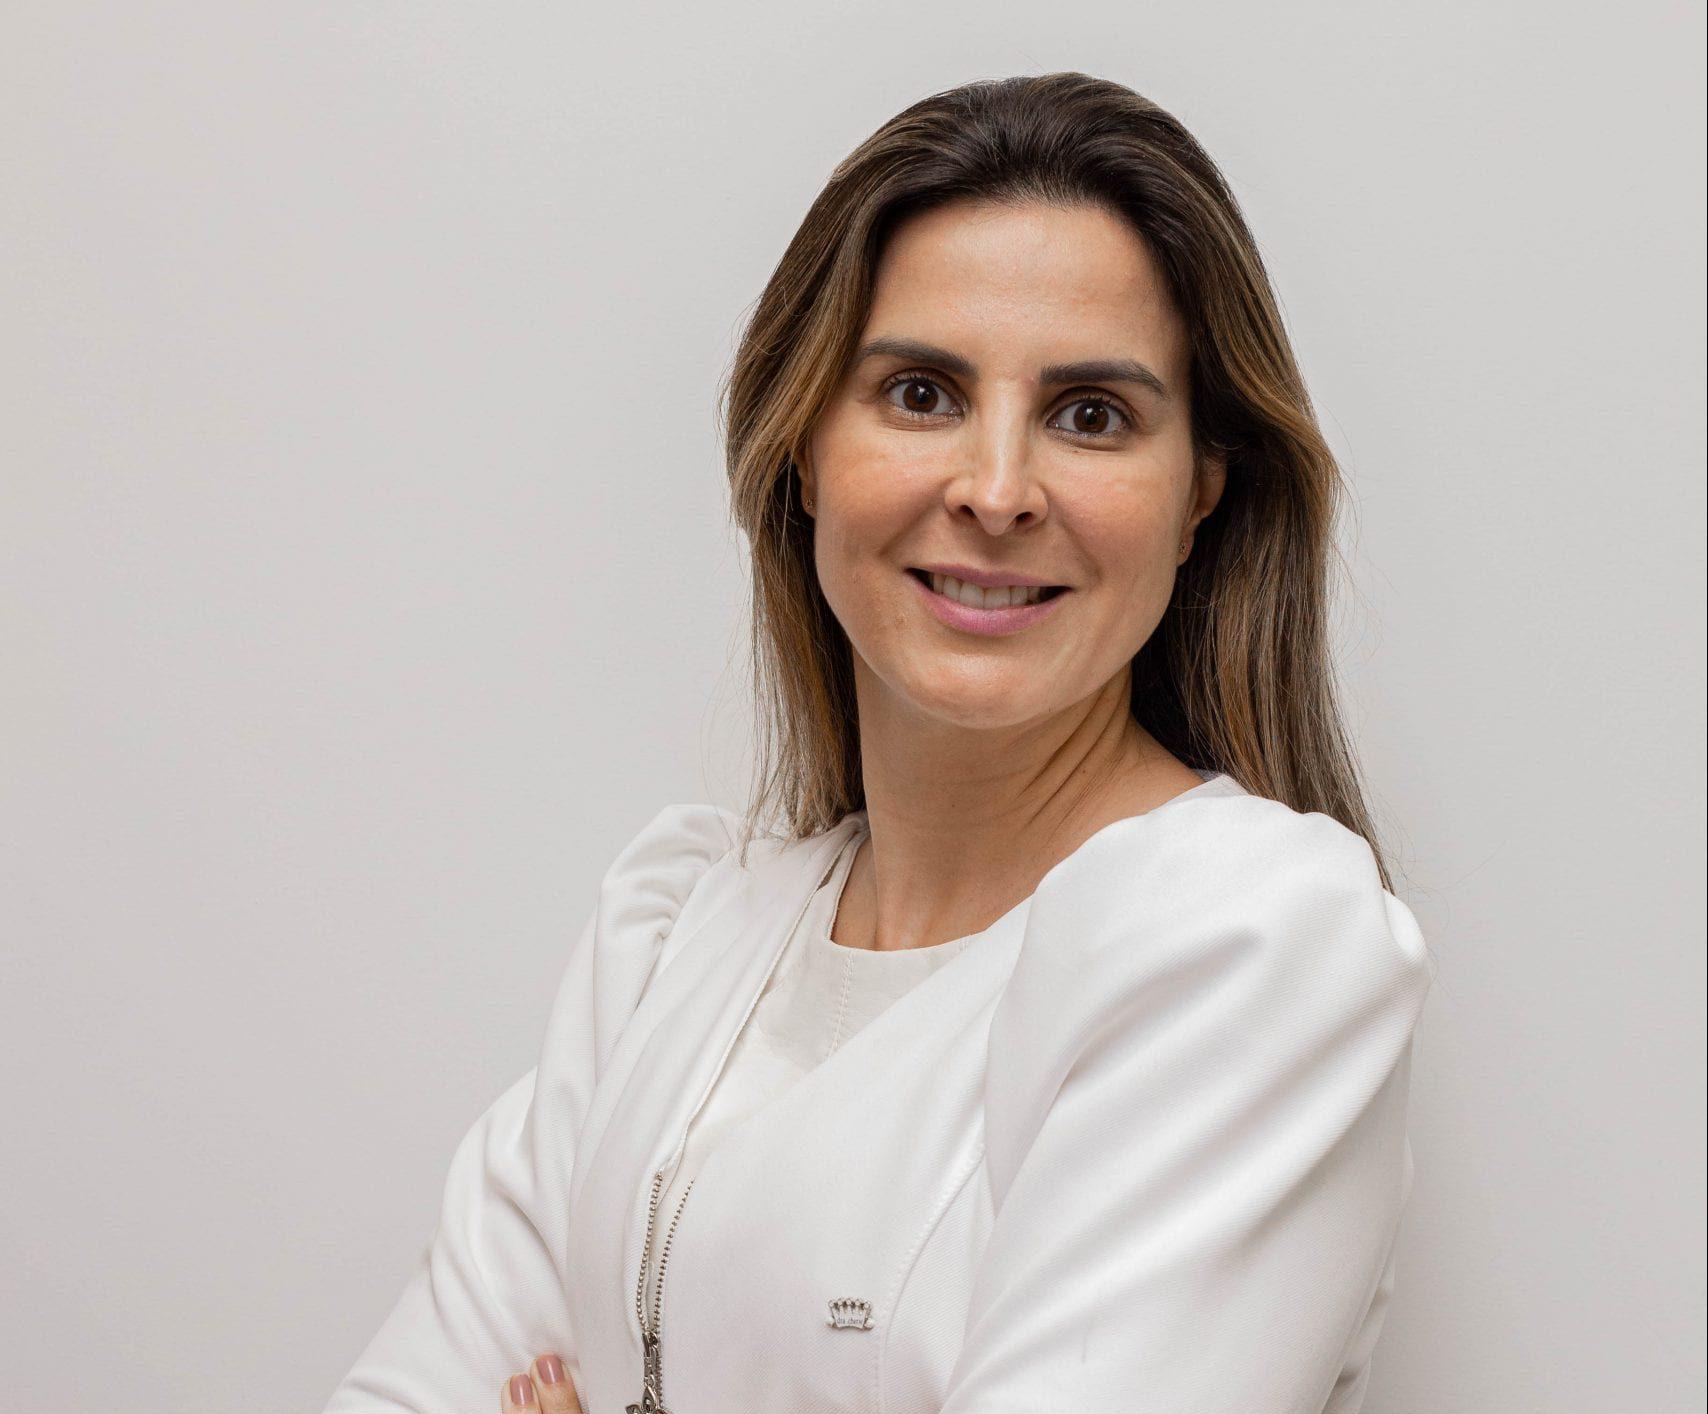 Ana Luiza Alvarenga